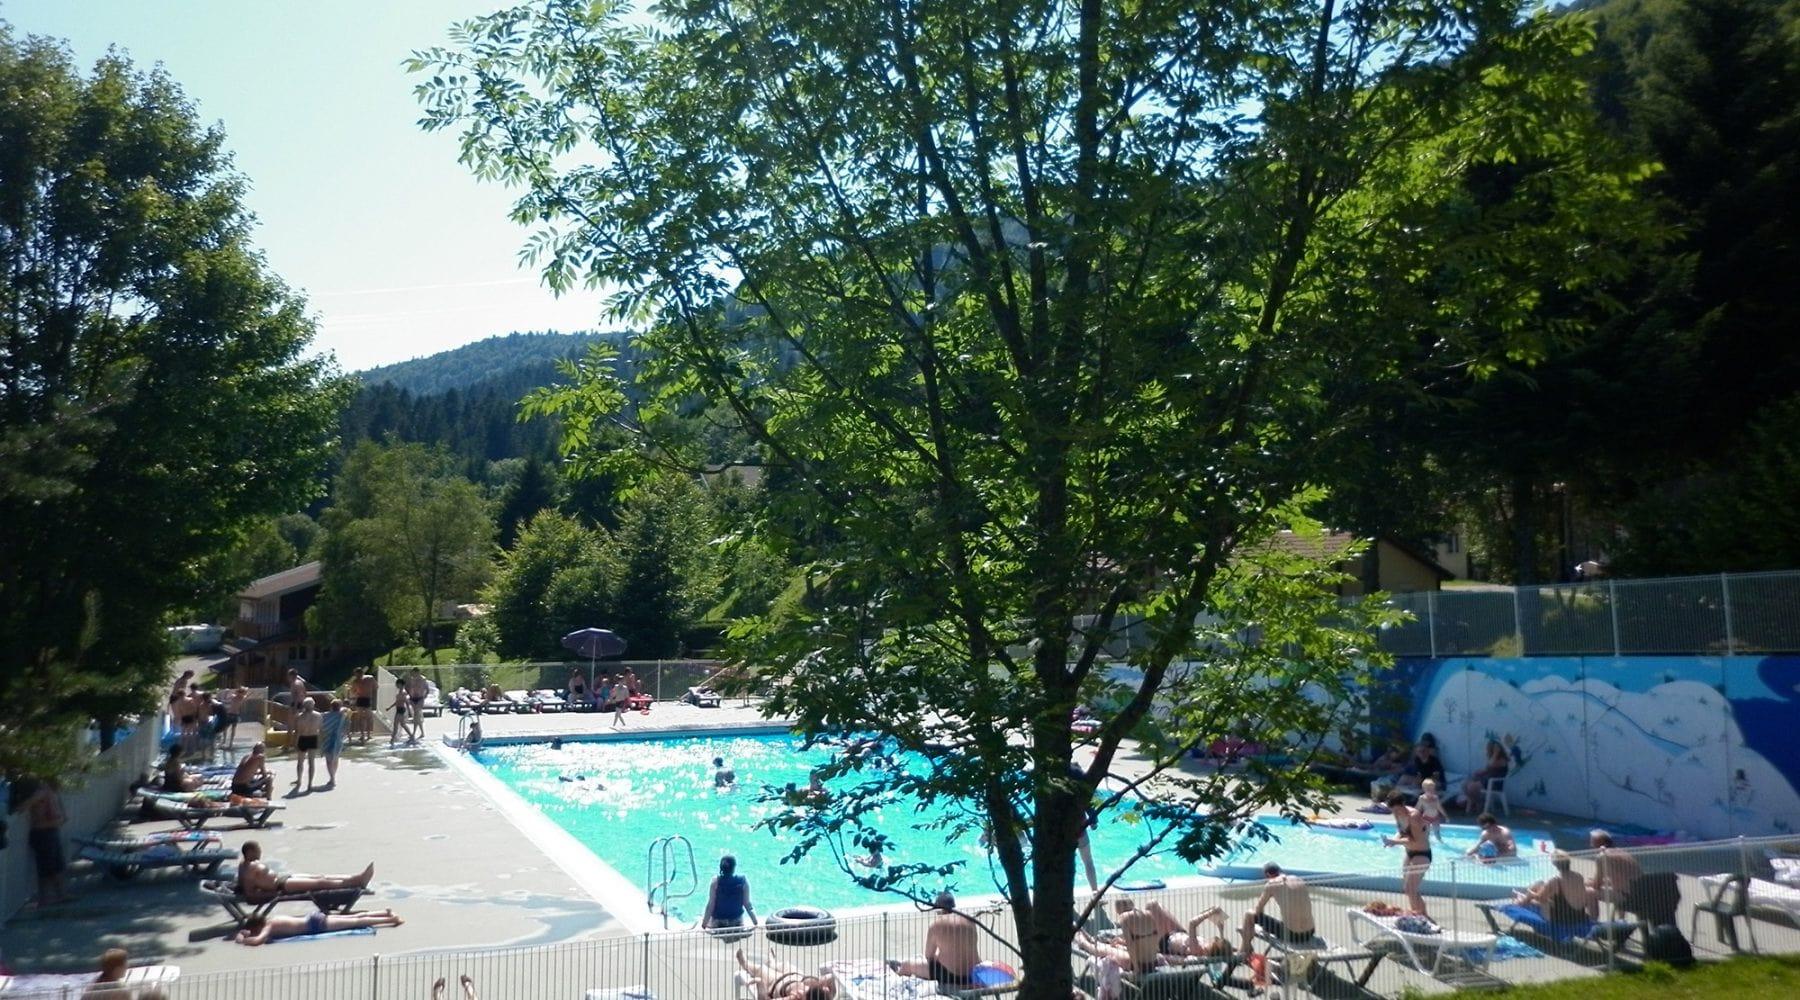 Camping Vosges | Camping Belle Hutte La Bresse Proche Gerardmer tout Piscine Rouffach